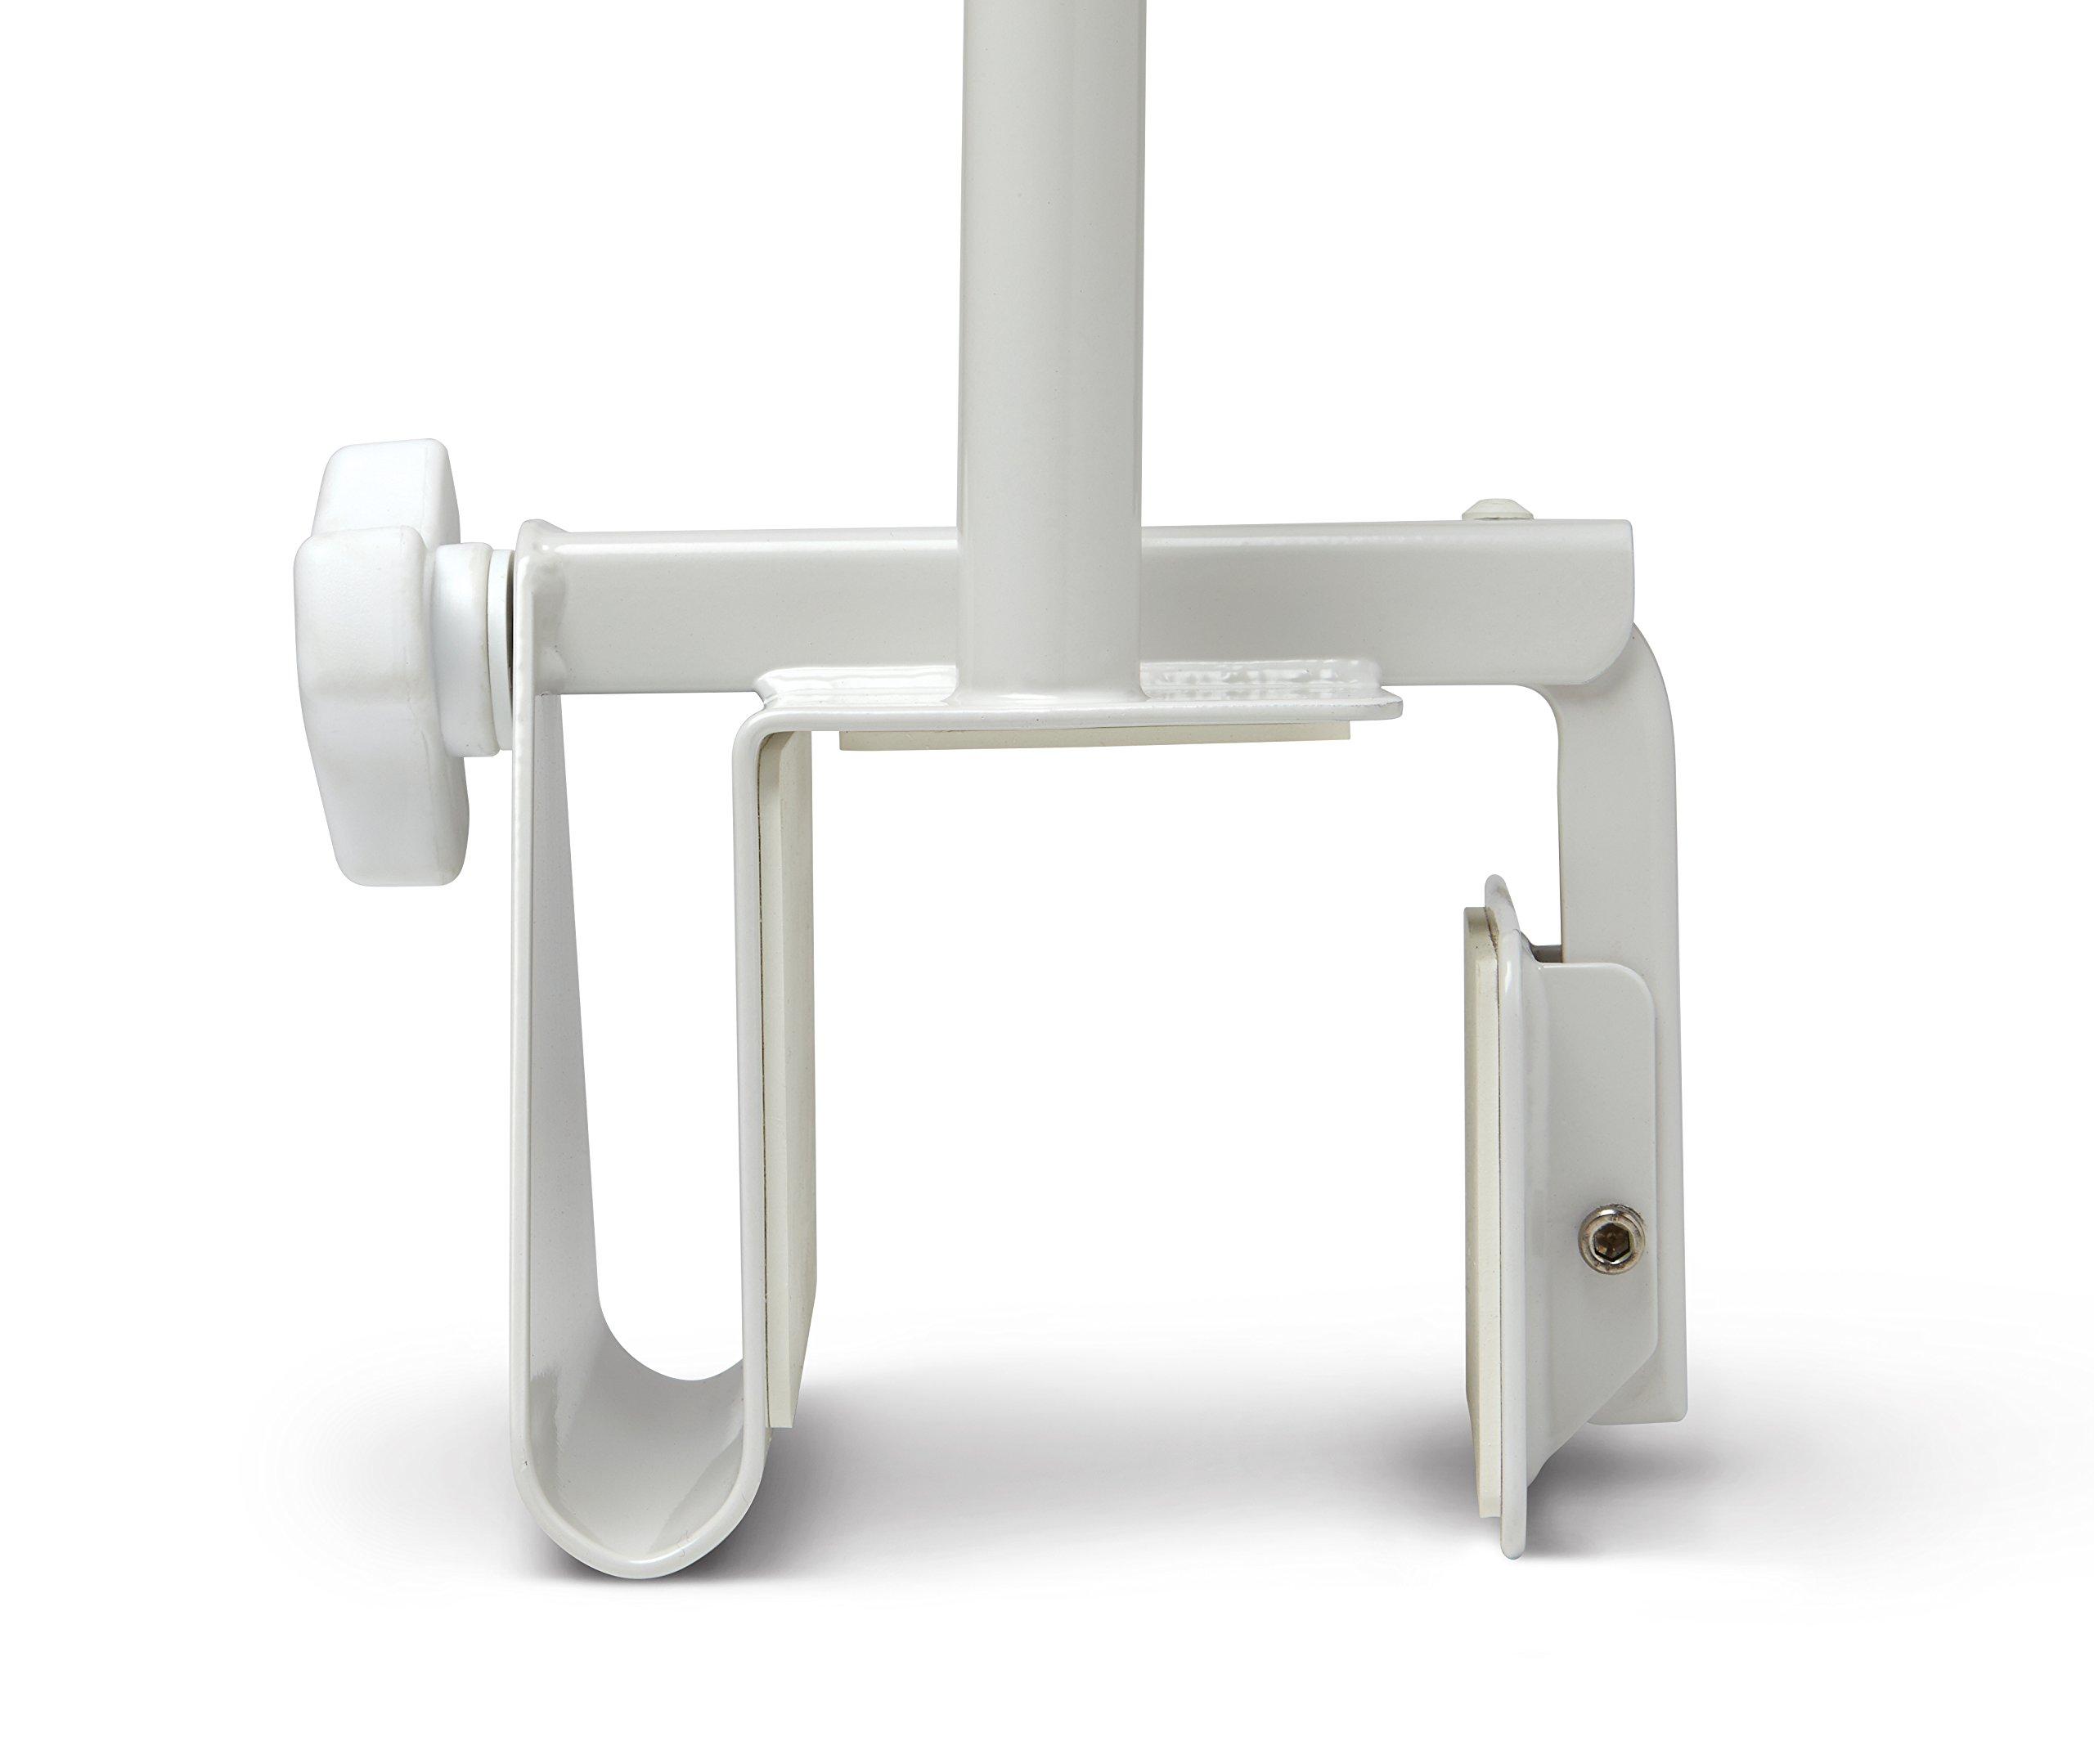 Medline Bathtub Bar Locks to Side of Tub  amazoncom